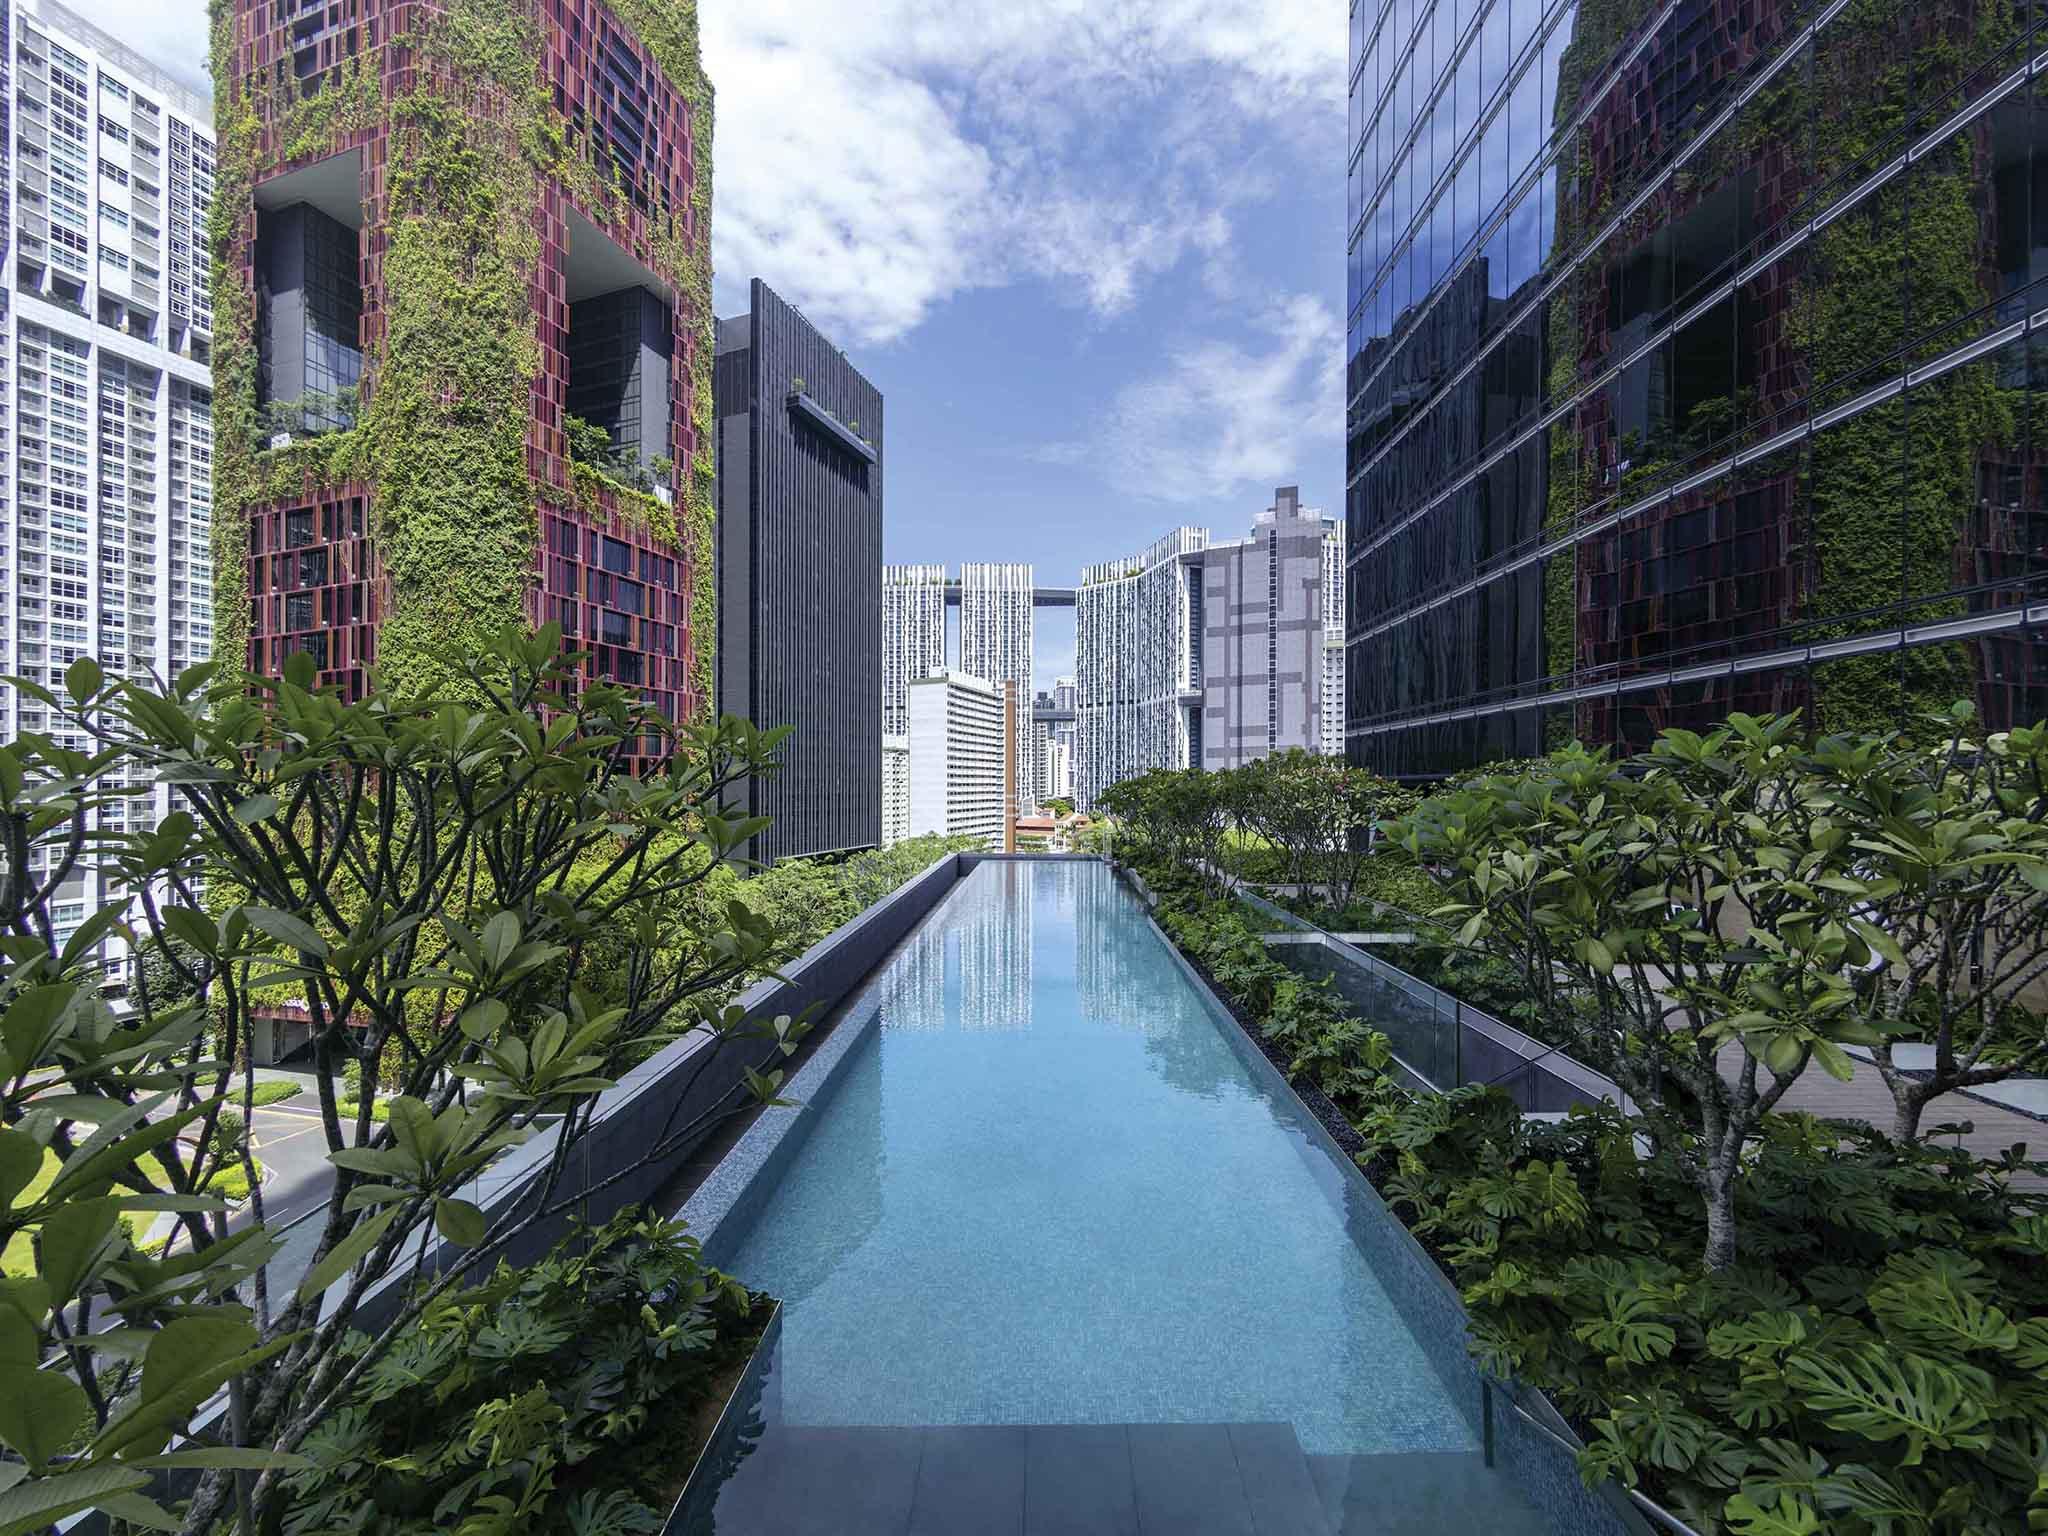 فندق - فندق سوفيتل Sofitel سنغافورة سيتي سنتر